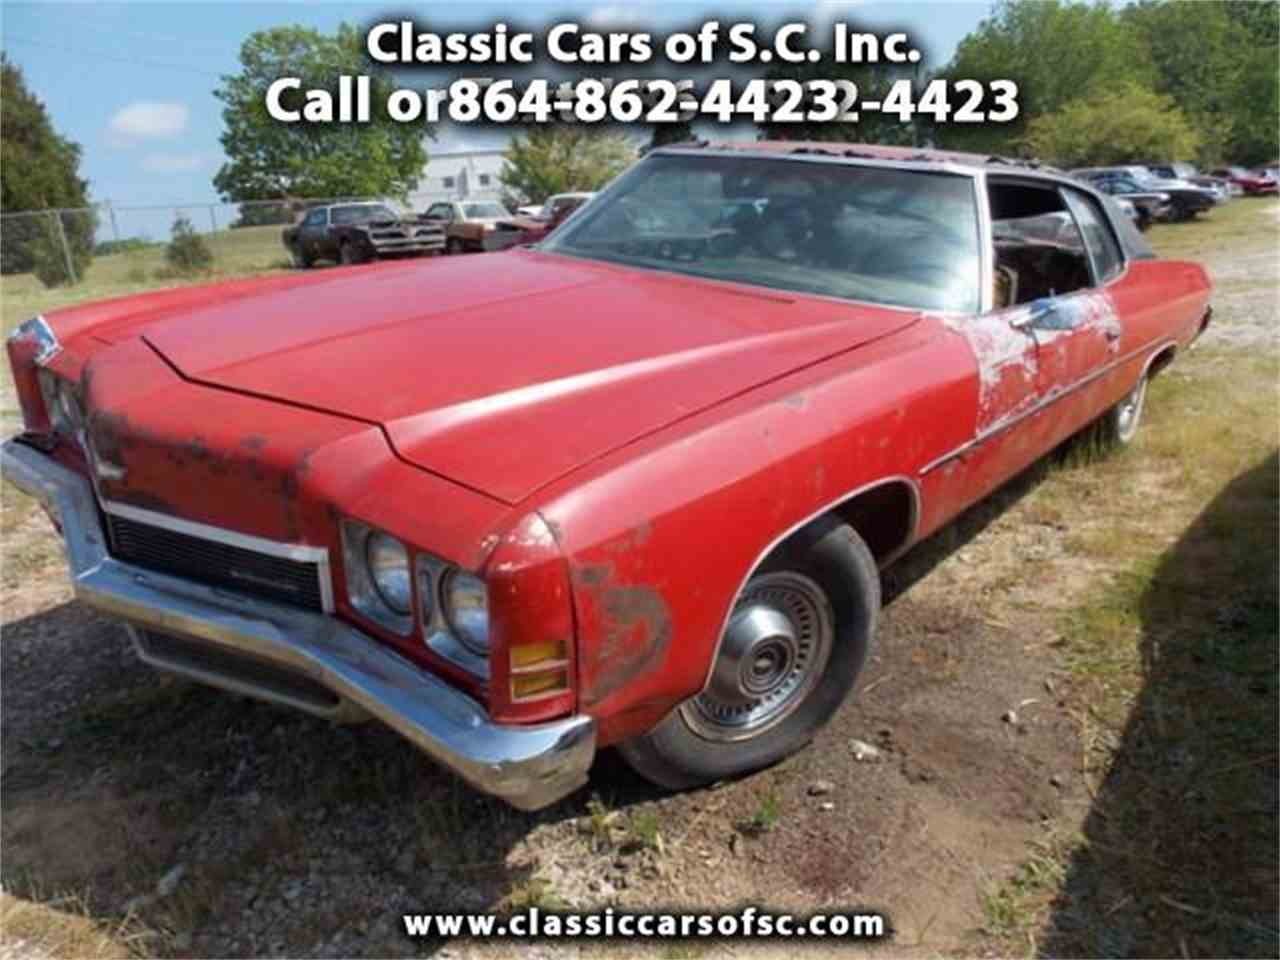 Impala 1972 chevrolet impala for sale : 1972 Chevrolet Impala for Sale | ClassicCars.com | CC-823410